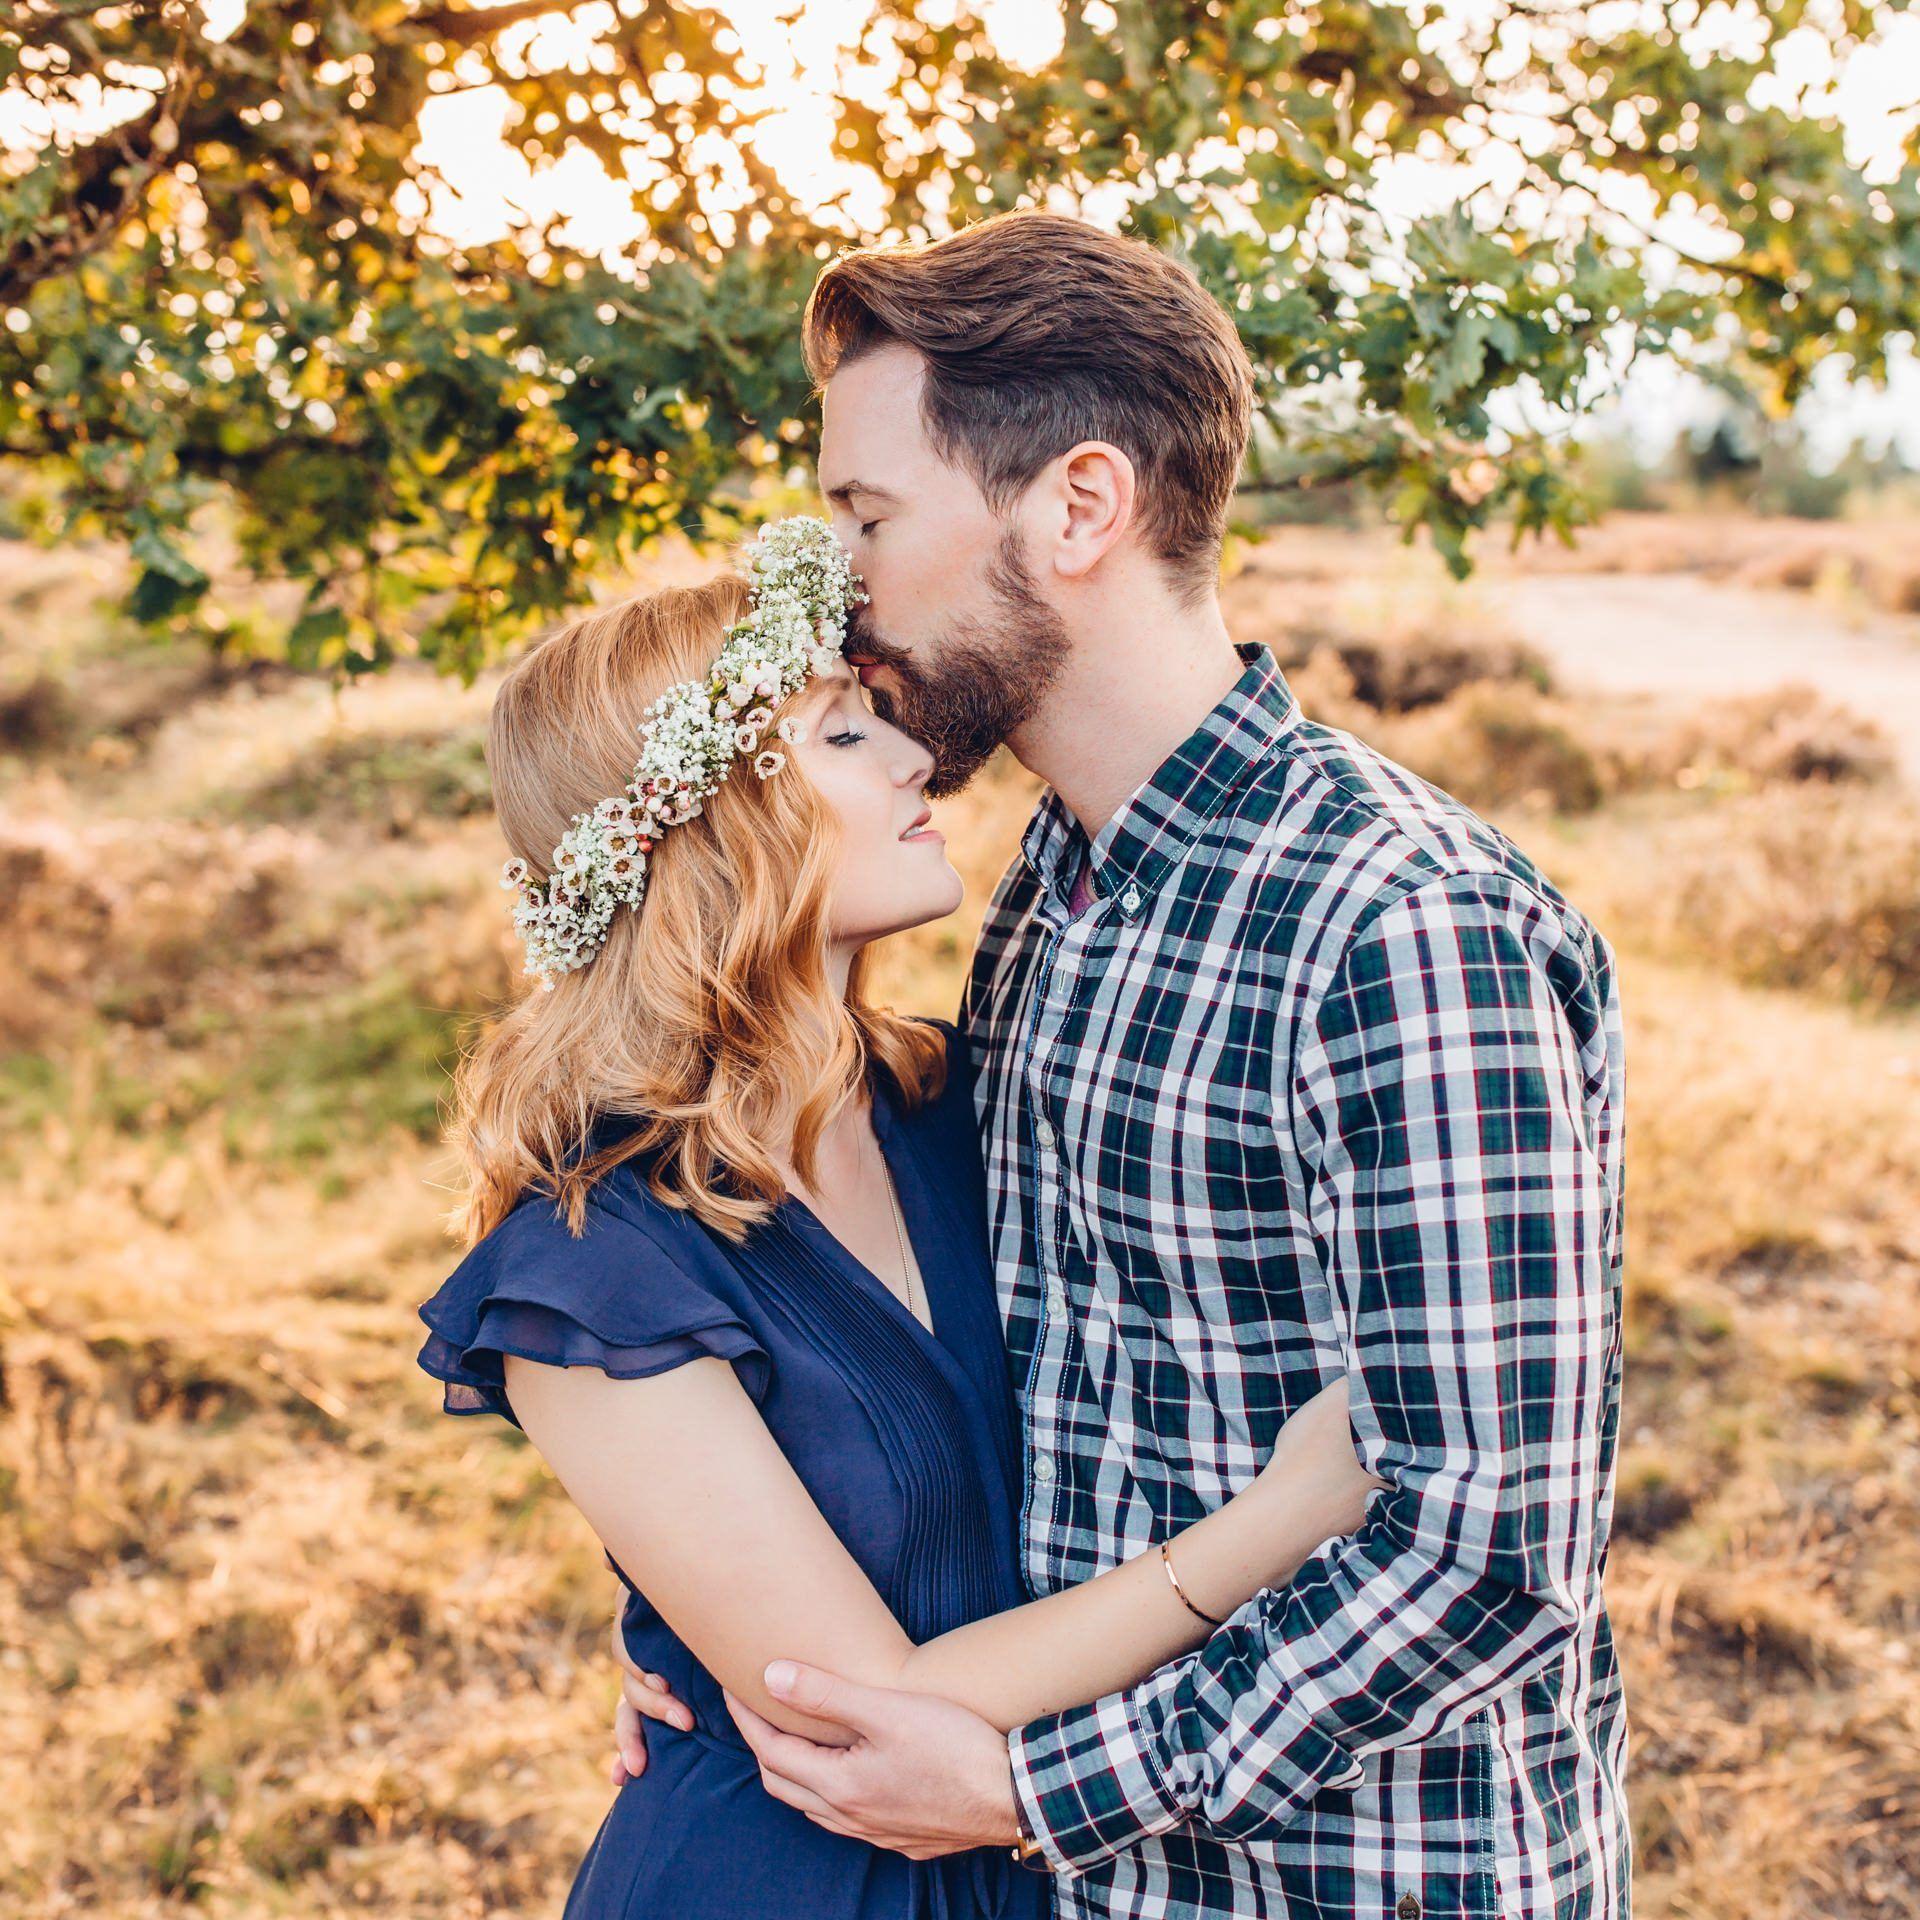 By Ljuba Gonchar,Pärchen Shooting, Couples, Engagement